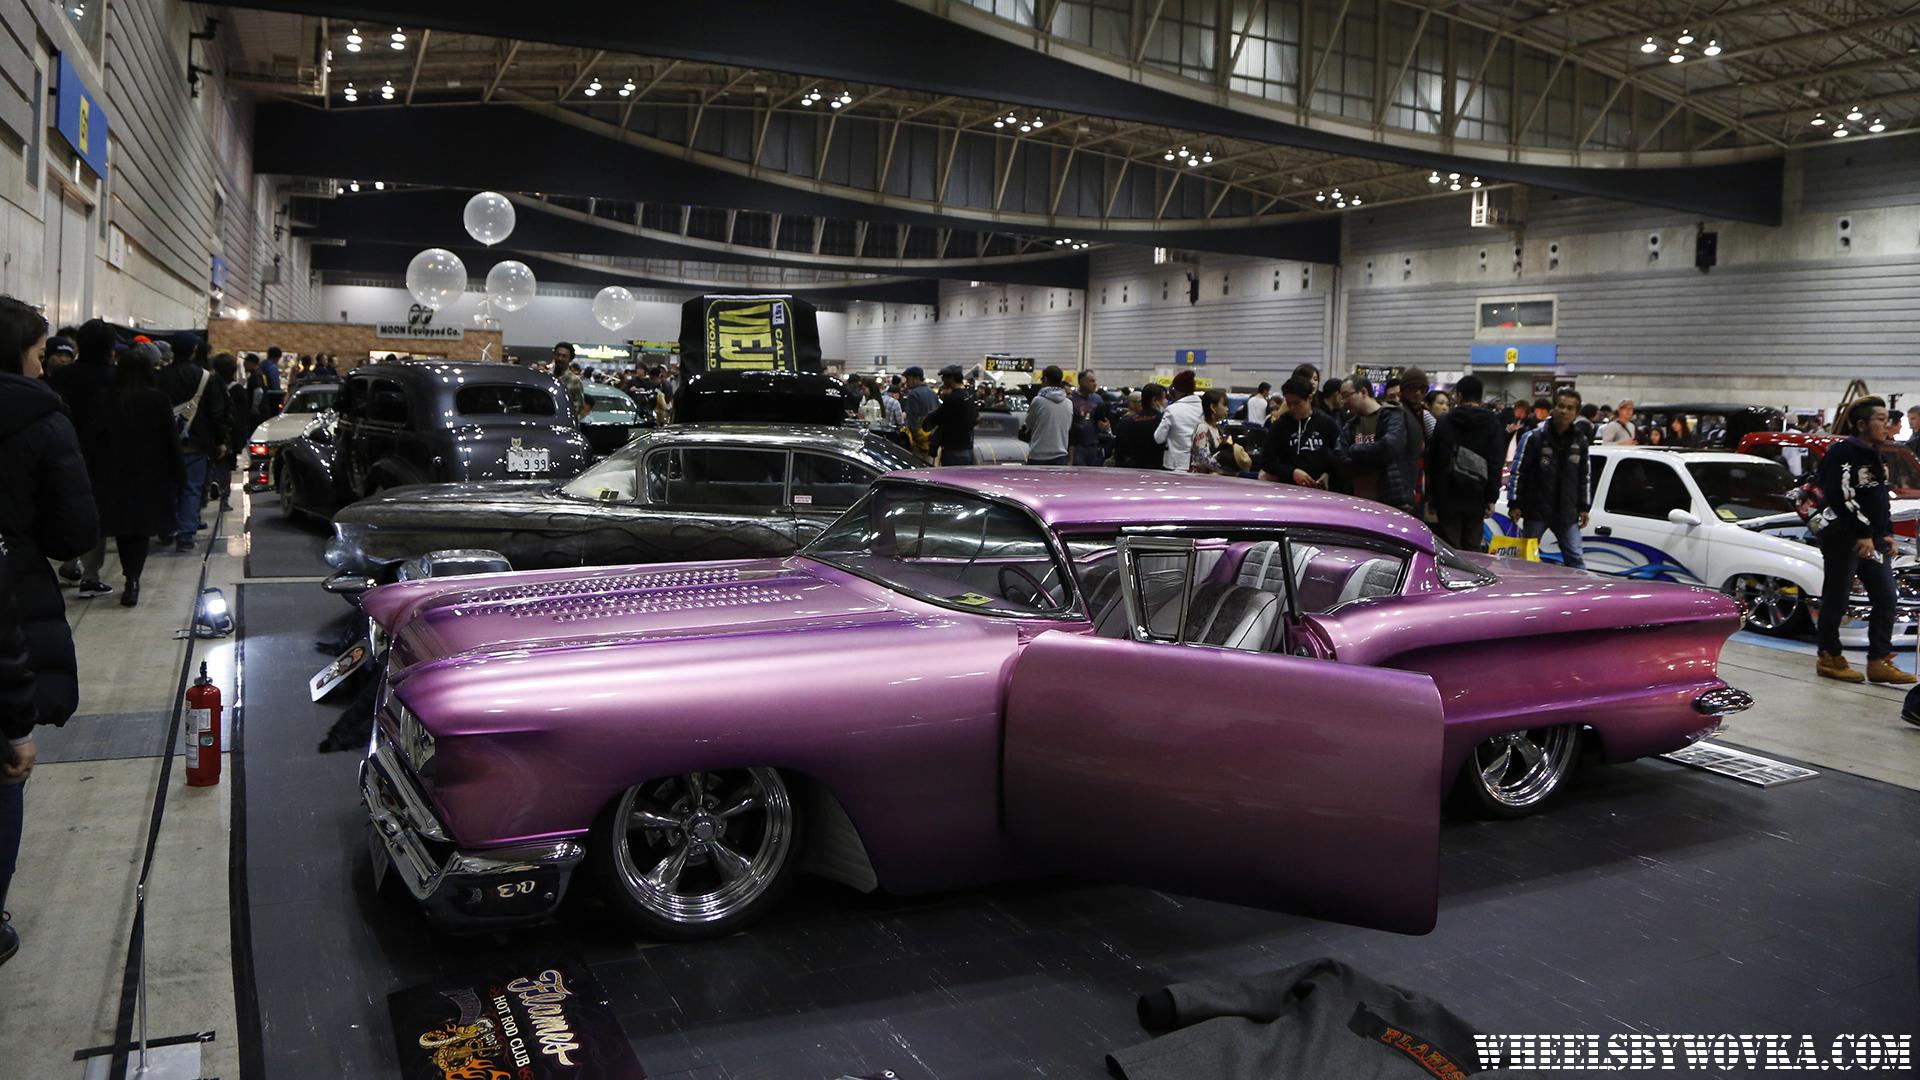 mooneyes-yokohama-hot-rod-custom-show-cars-2017-27